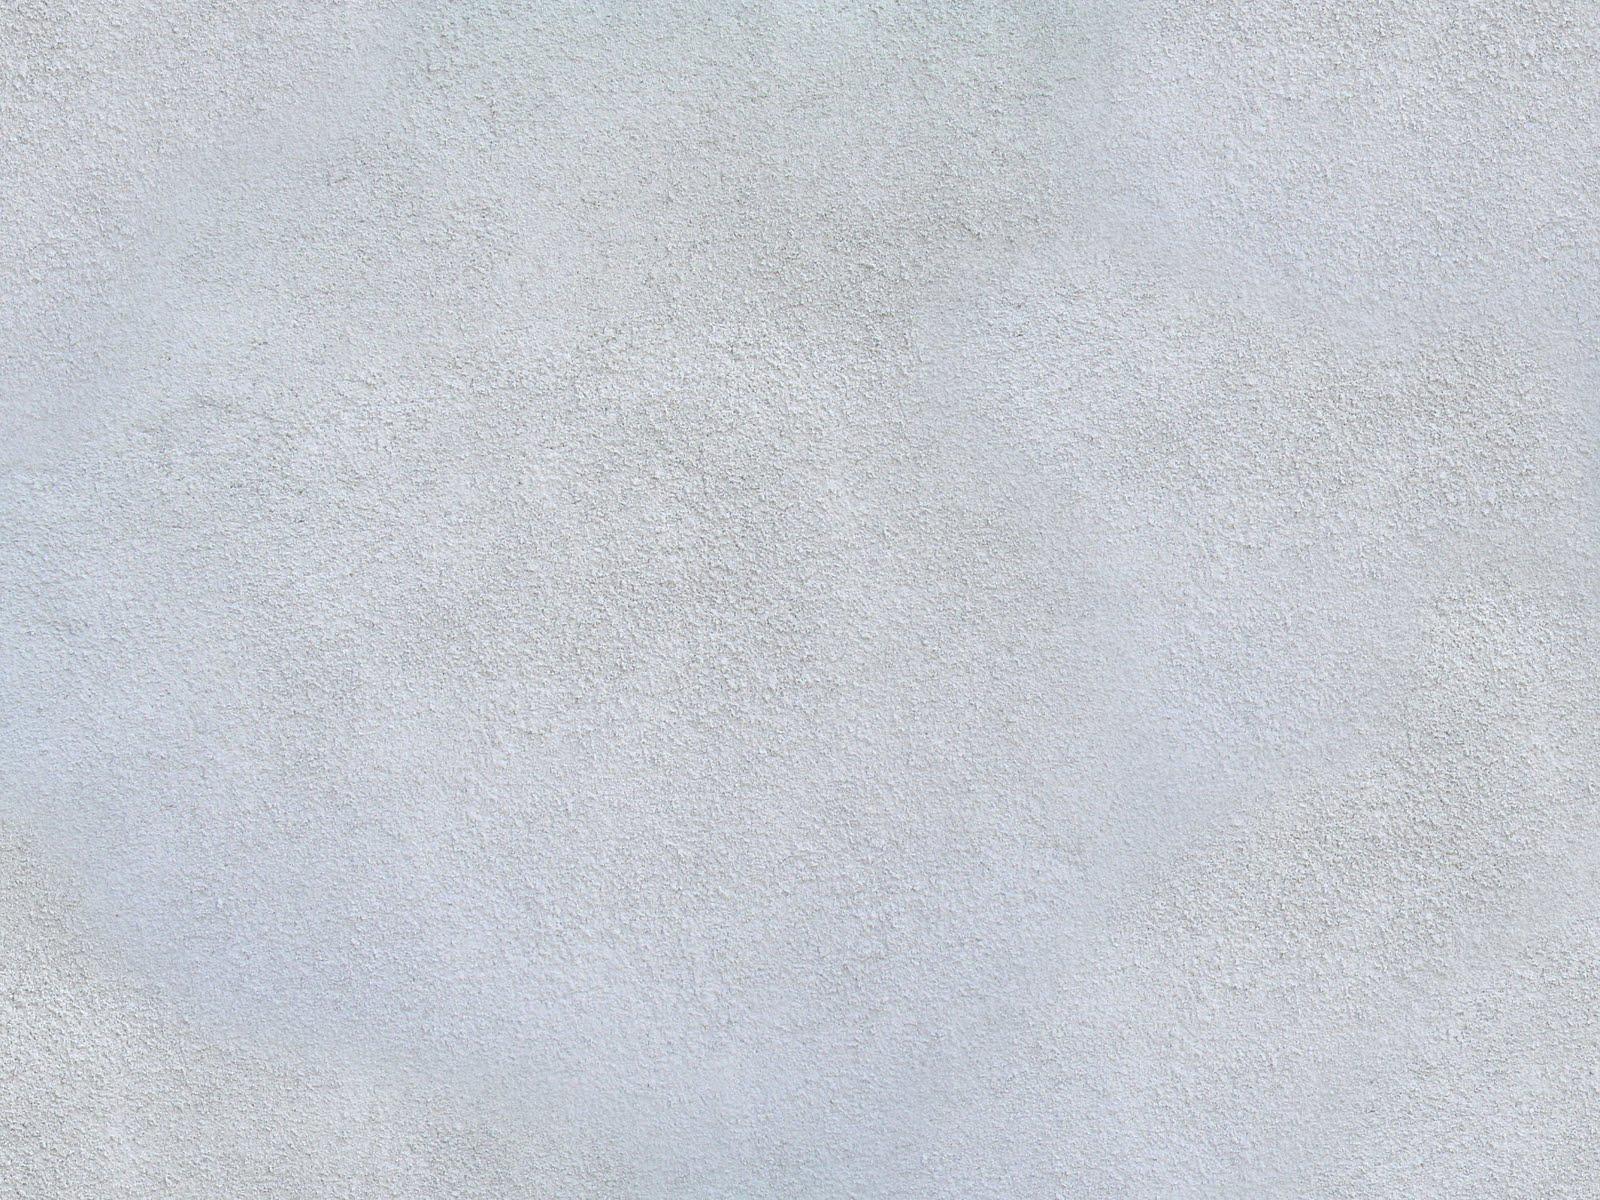 concrete flooring texture. Concrete Flooring Texture F